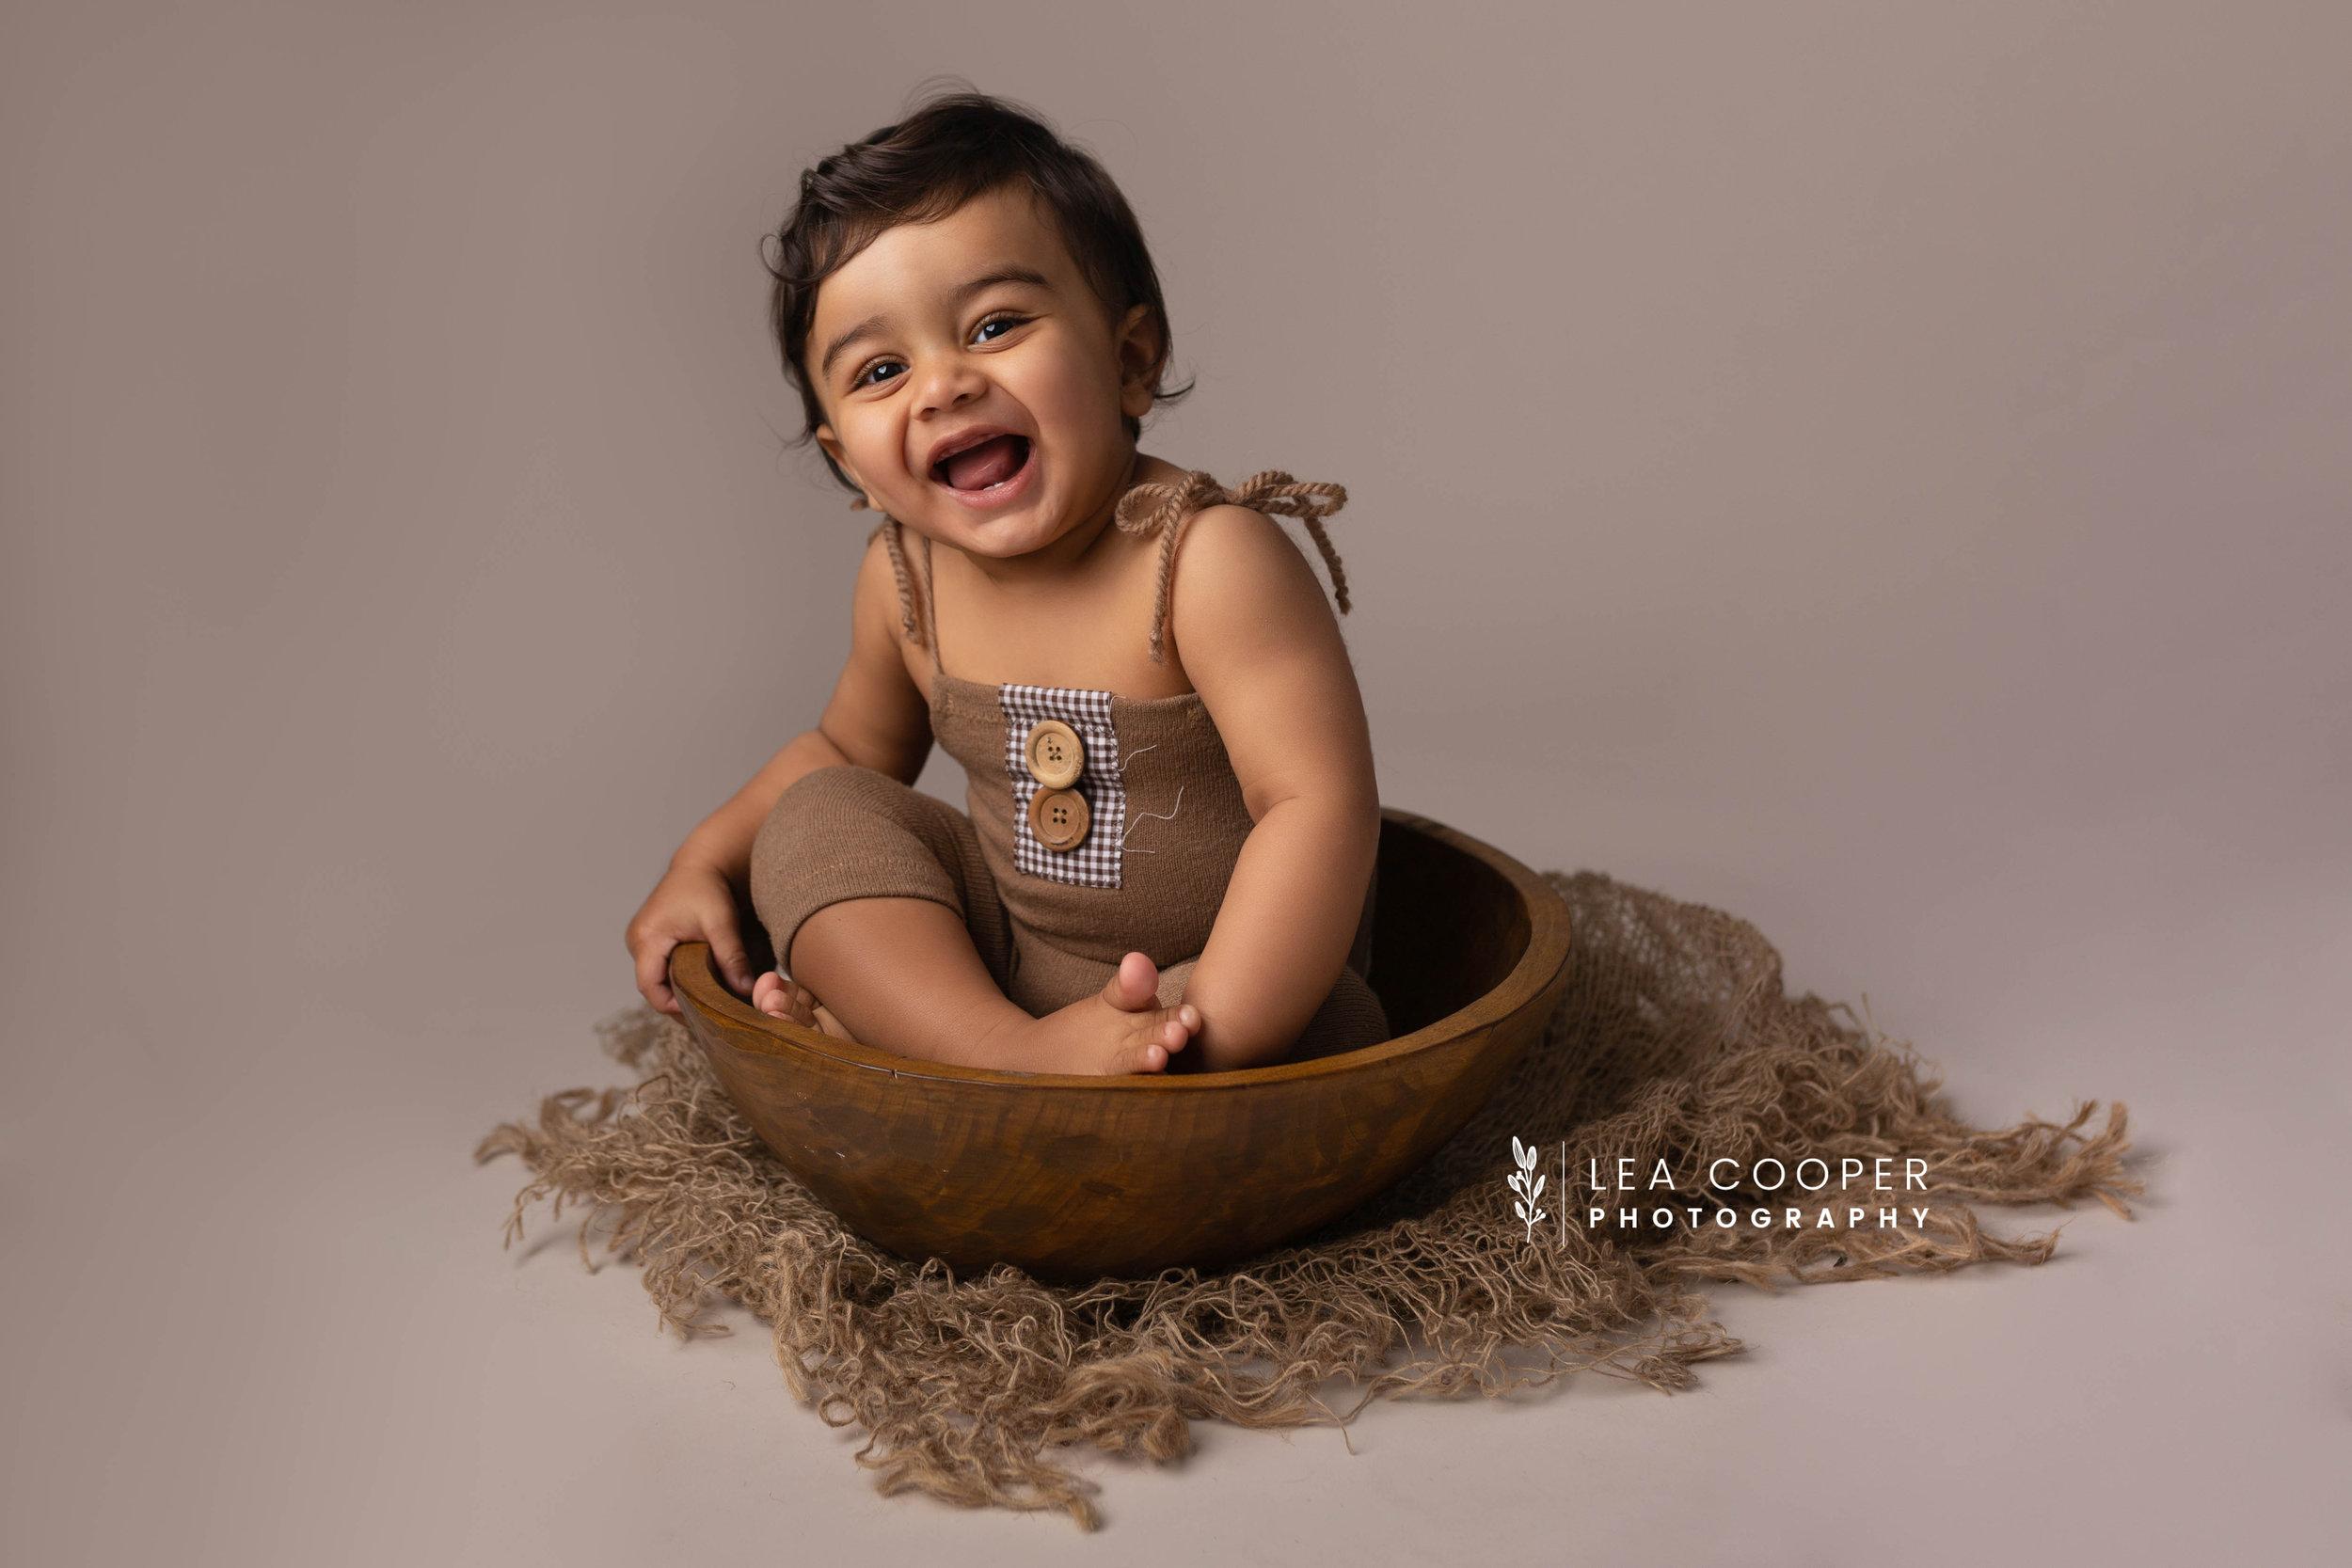 LEA-COOPER-PHOTOGRAPHY-CAKE-SMASH-PHOTOGRAPHER-WILLENALL-WOLVERHAMPTON-CHILD-PHOTOSHOOT-1ST—BIRTHDAY-PICTURES-WEDNESBURY-WALSALL-DUDLEY-WEST-MIDLANDS-UK-7.JPG